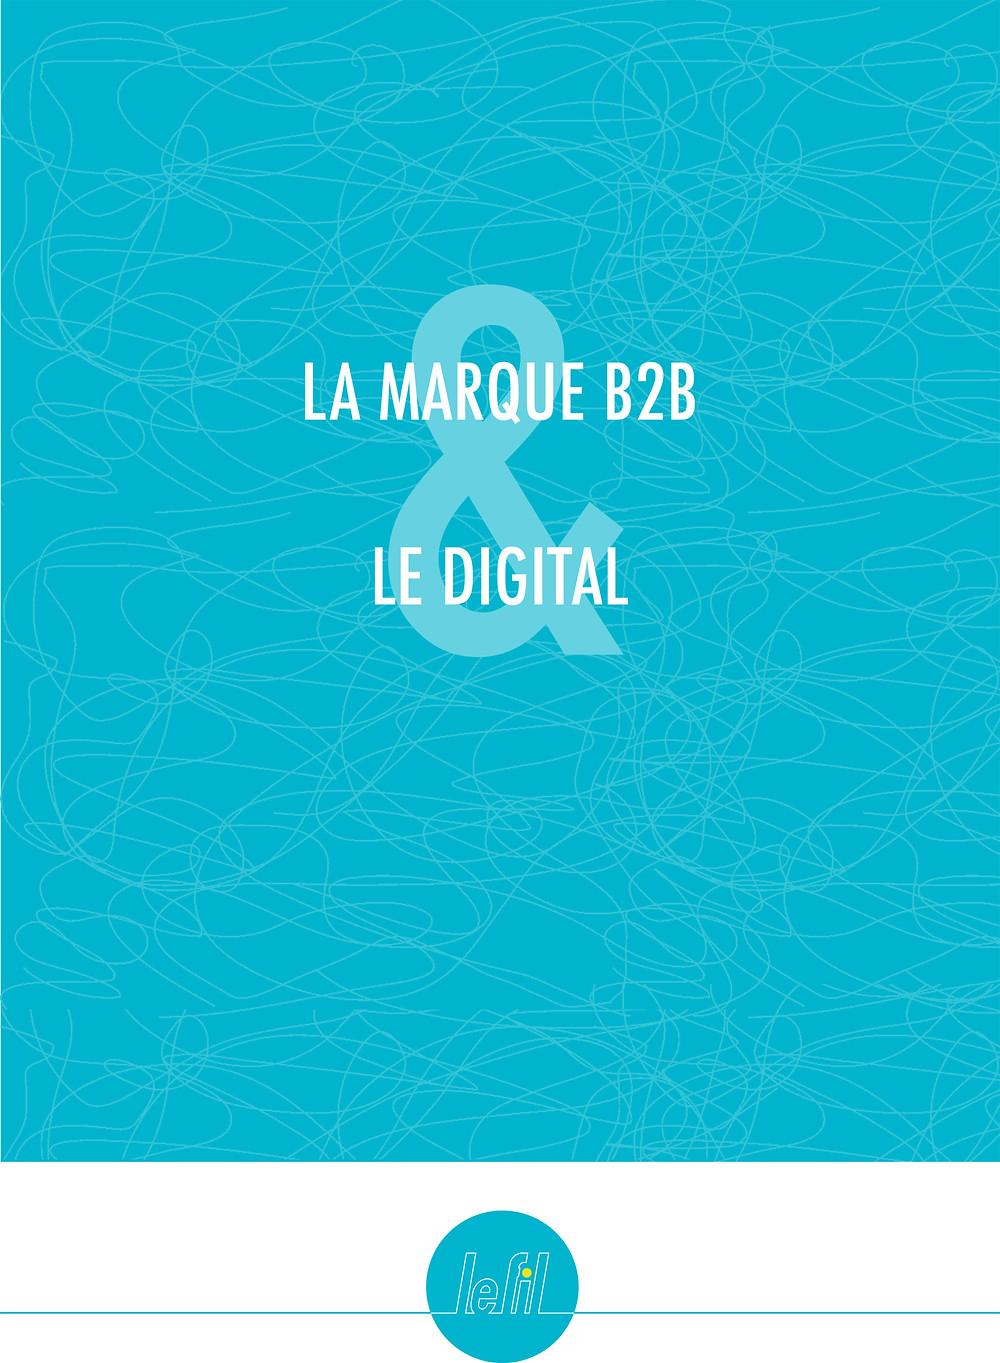 lamarqueB2B&ledigital